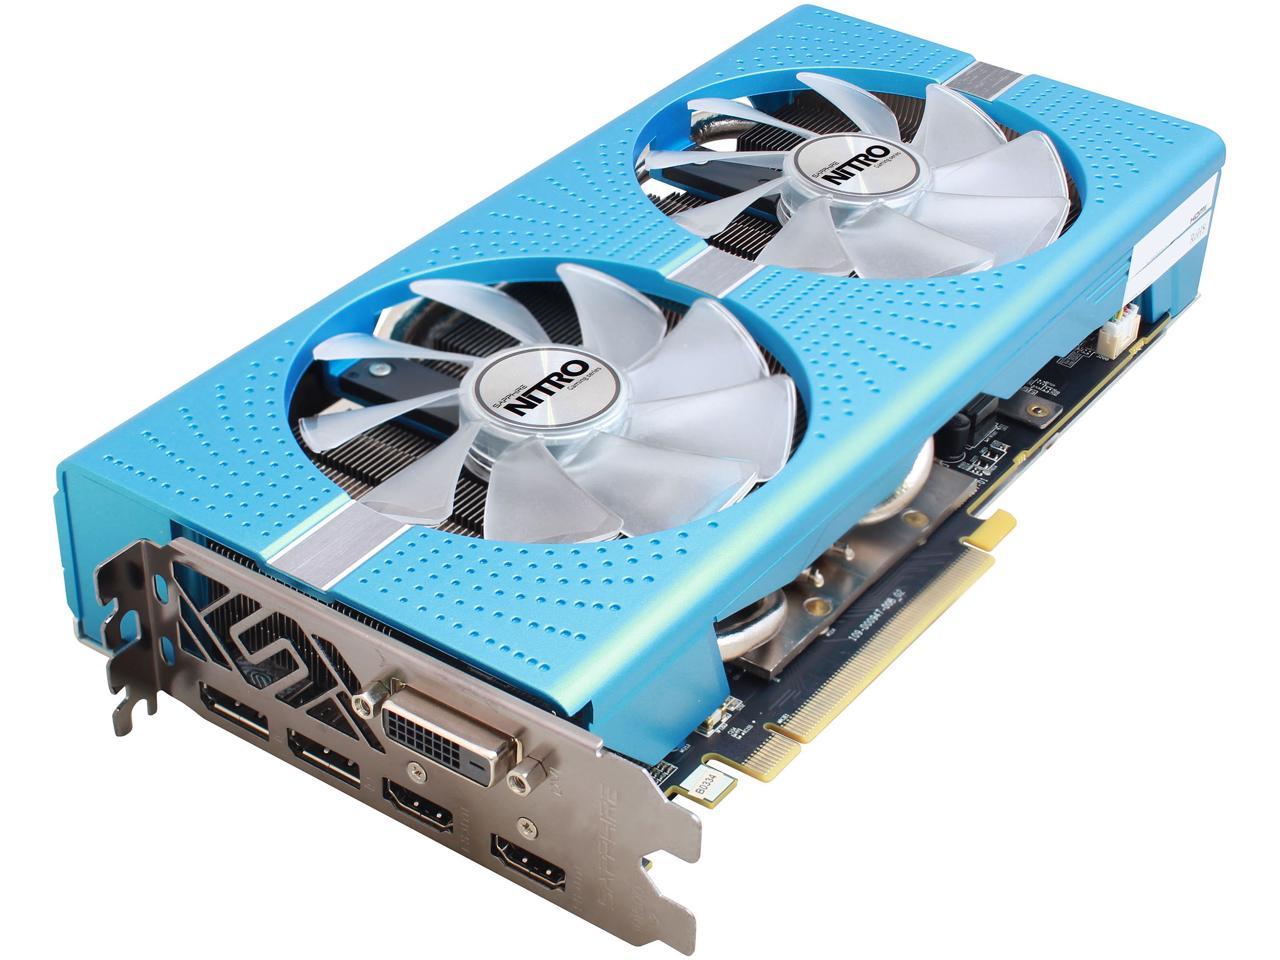 Sapphire Radeon NITRO+ RX 580 8GB GDDR5 309.99 In-stock